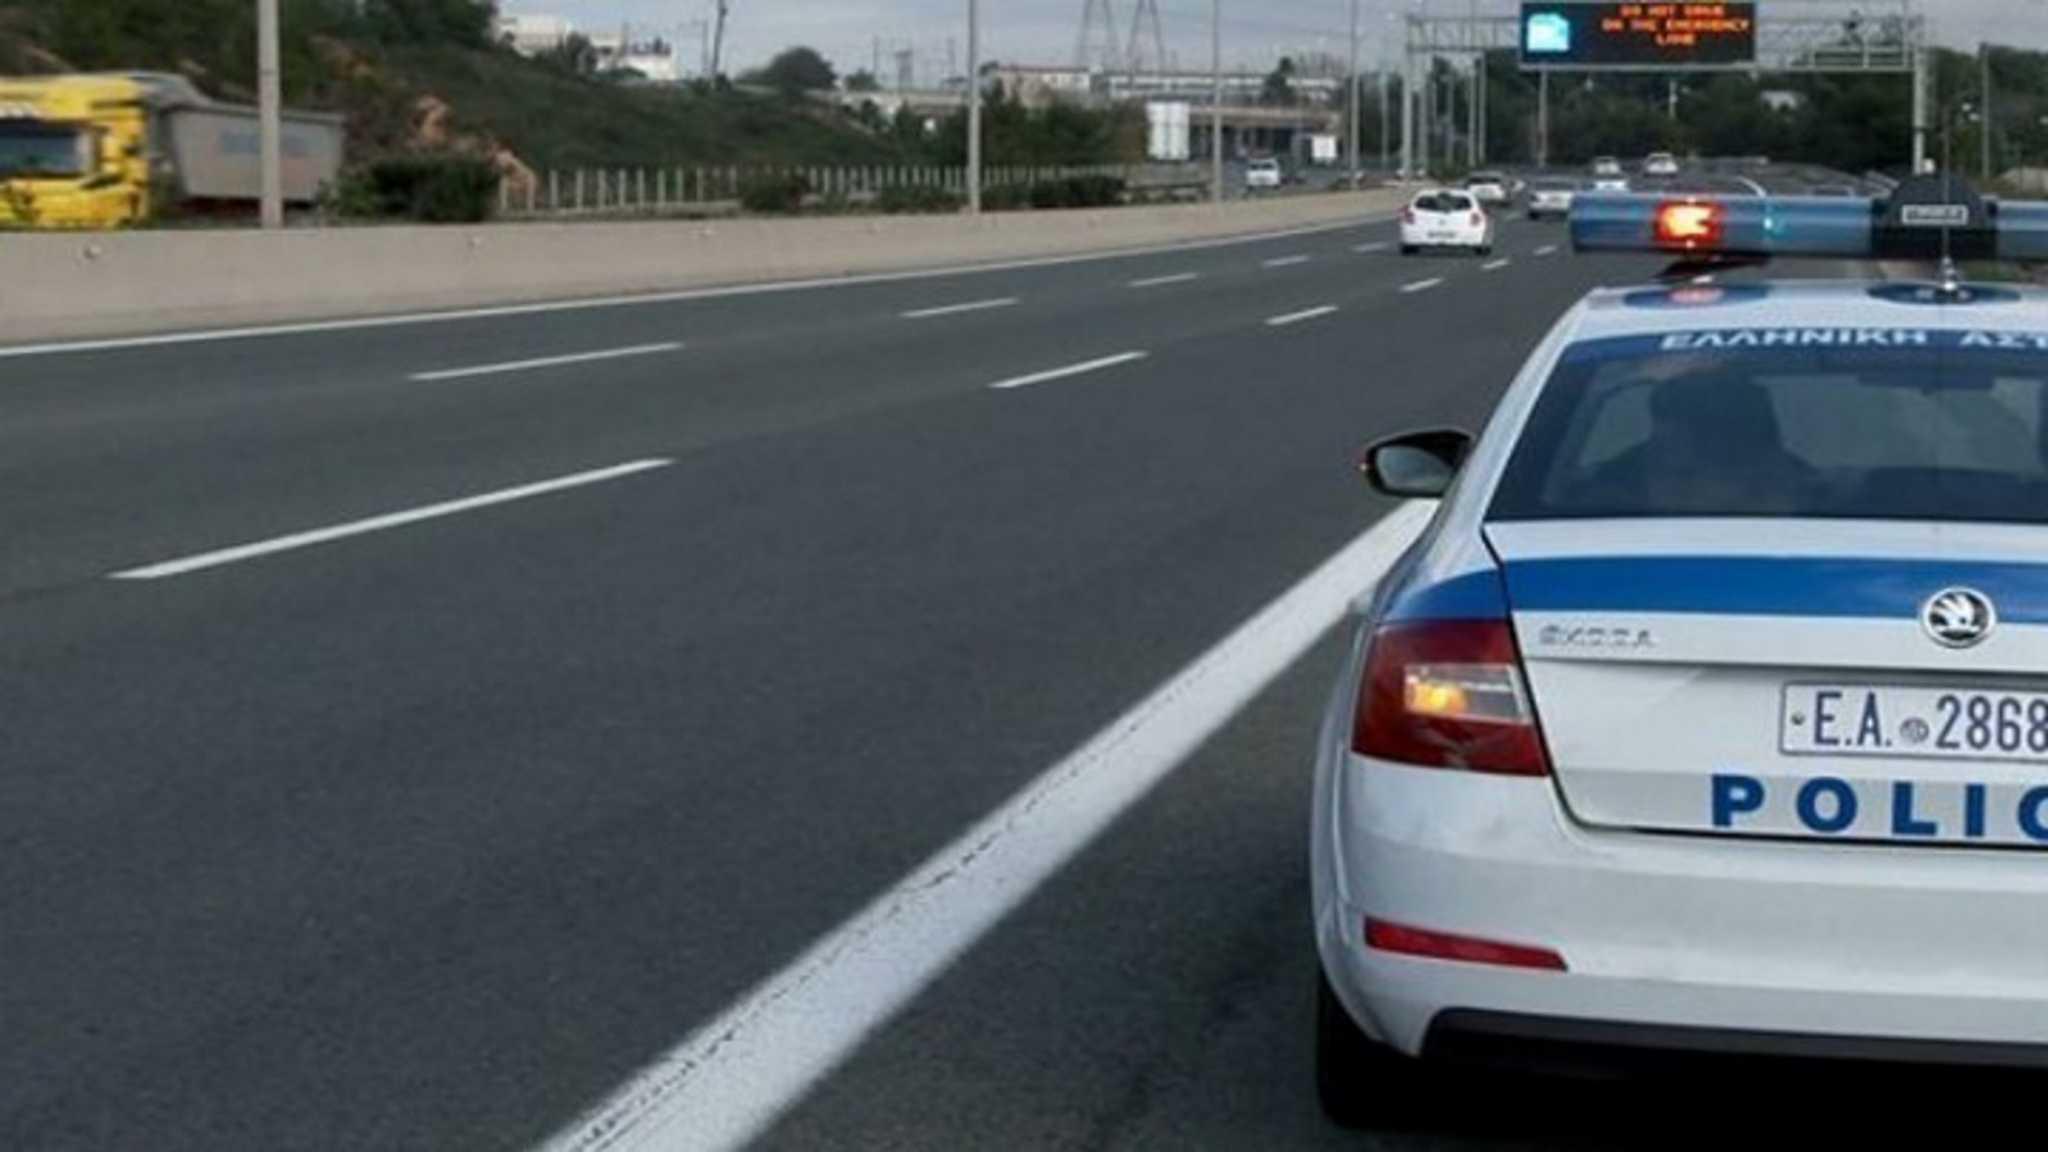 Lockdown – Κρήτη: «Βροχή» οι παραβάσεις και τα πρόστιμα – 3.430 έλεγχοι σε ένα 24ωρο